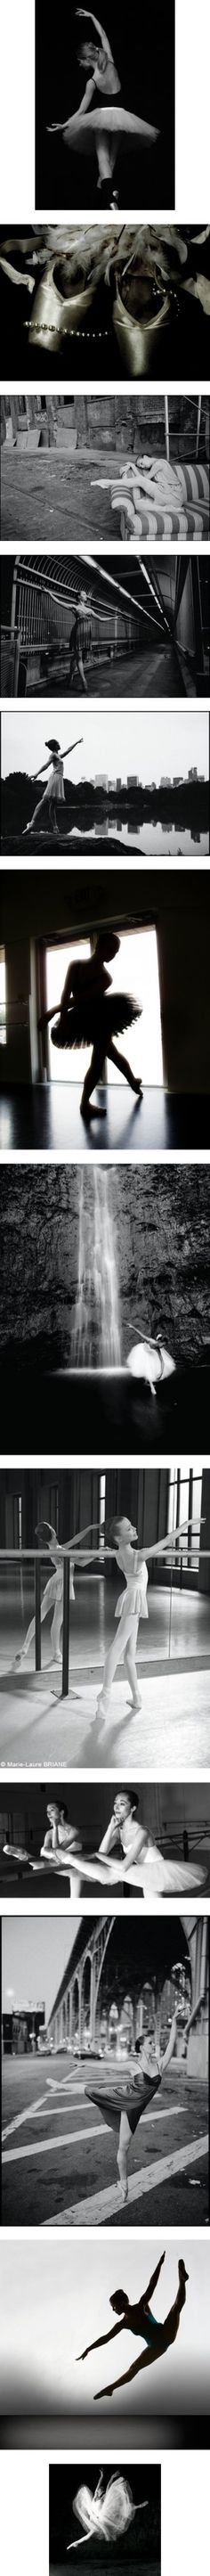 """100 Amazing Black and White Ballet Photographs I"" by kktt34 ❤ liked on Polyvore"